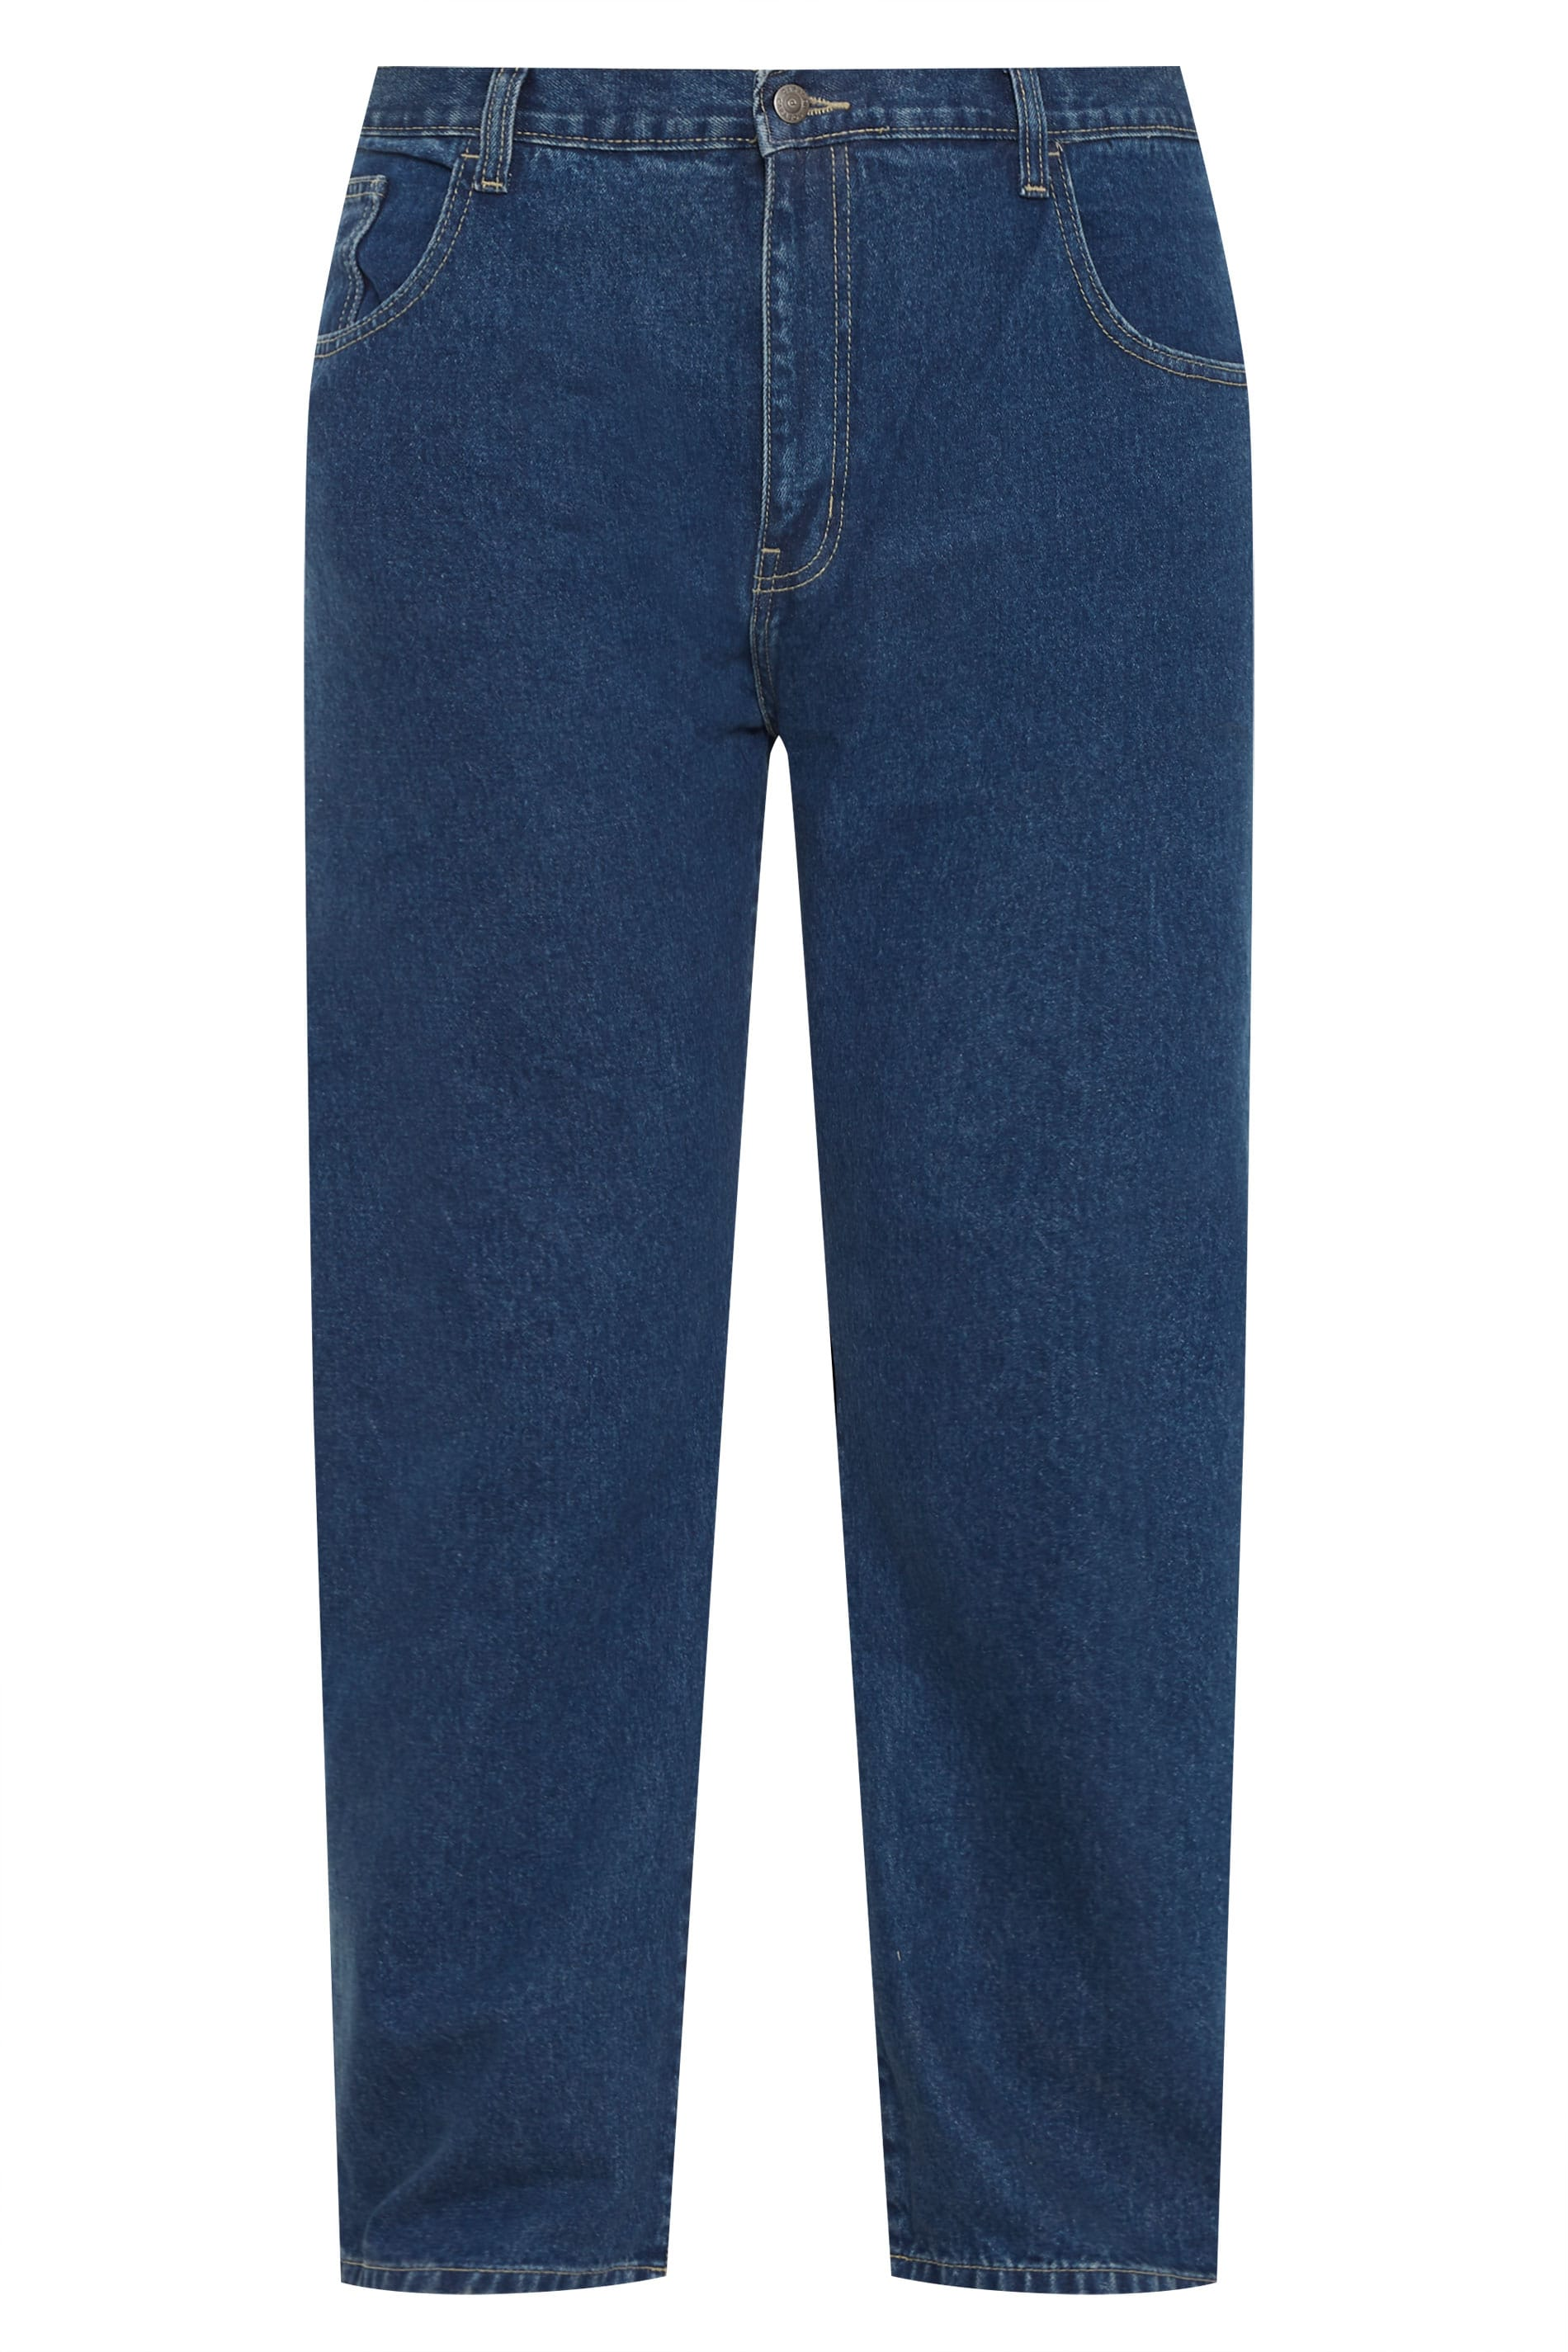 CARABOU Navy Stonewash Basic Jeans